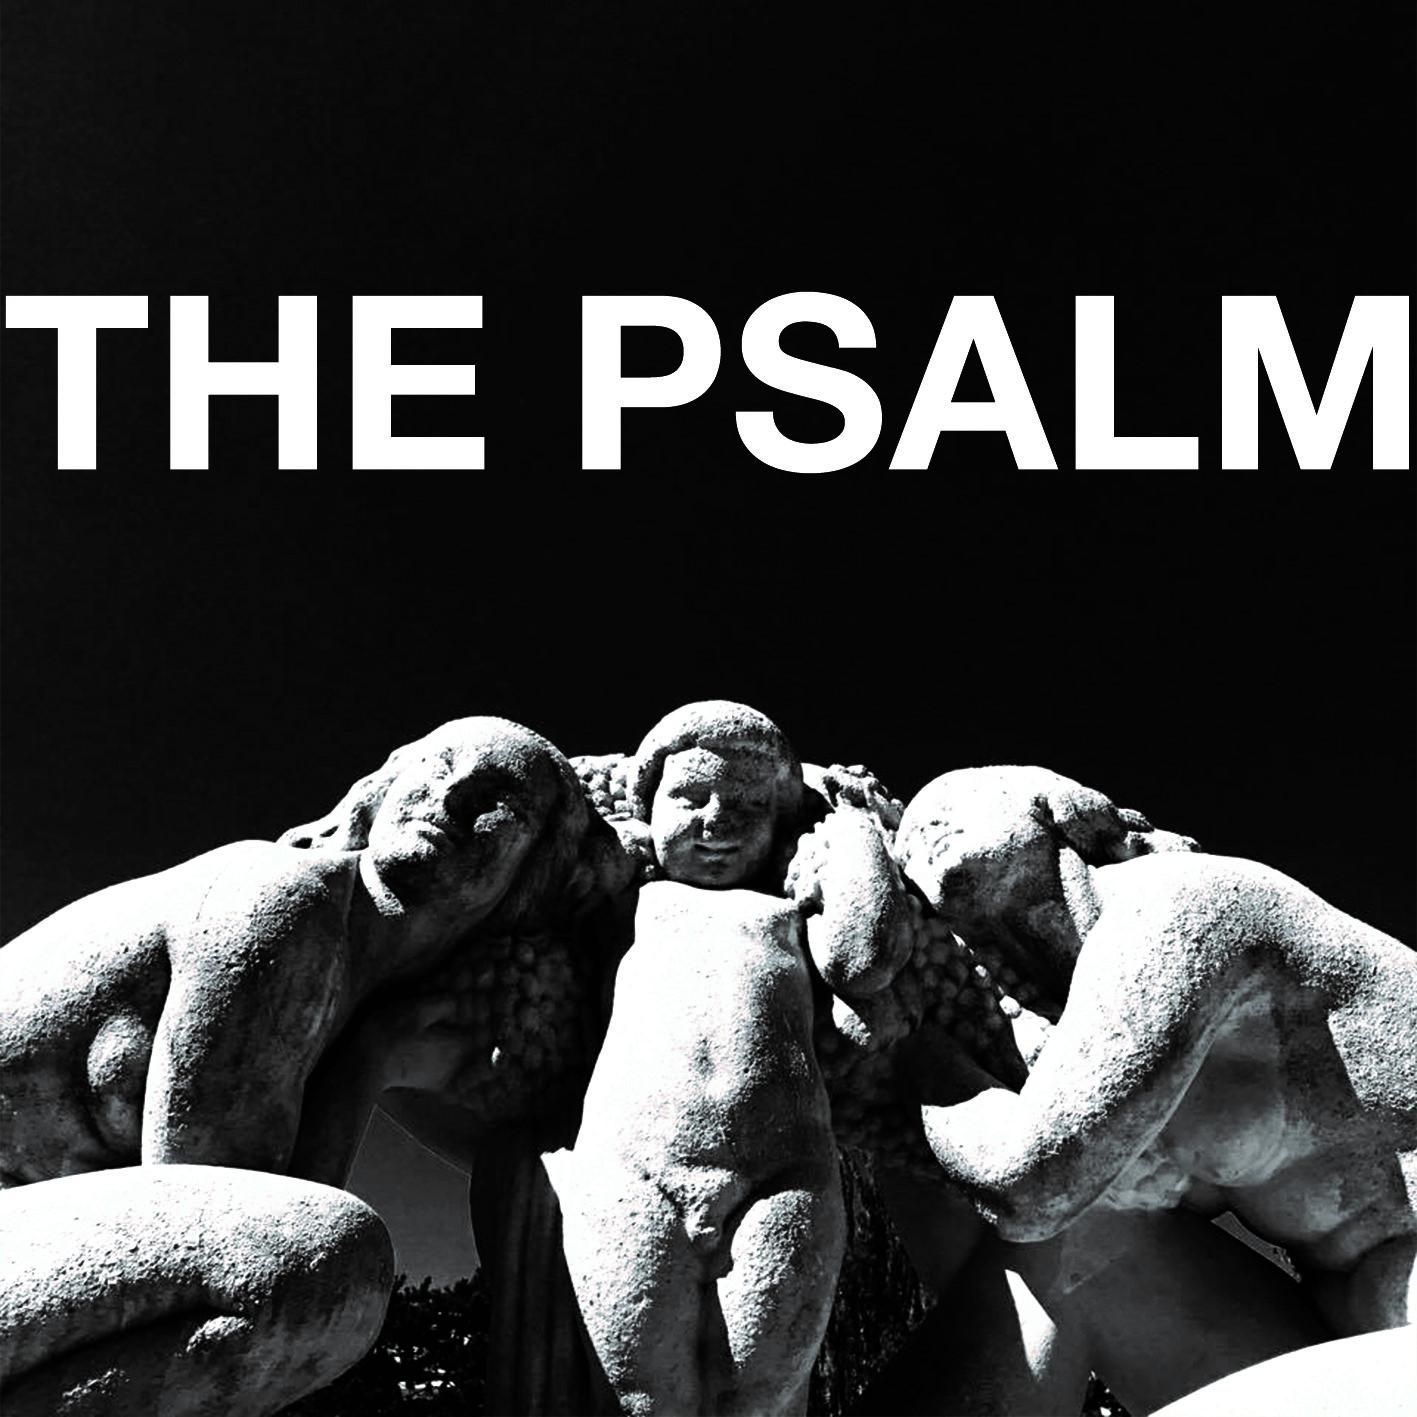 thepsalms.jpg